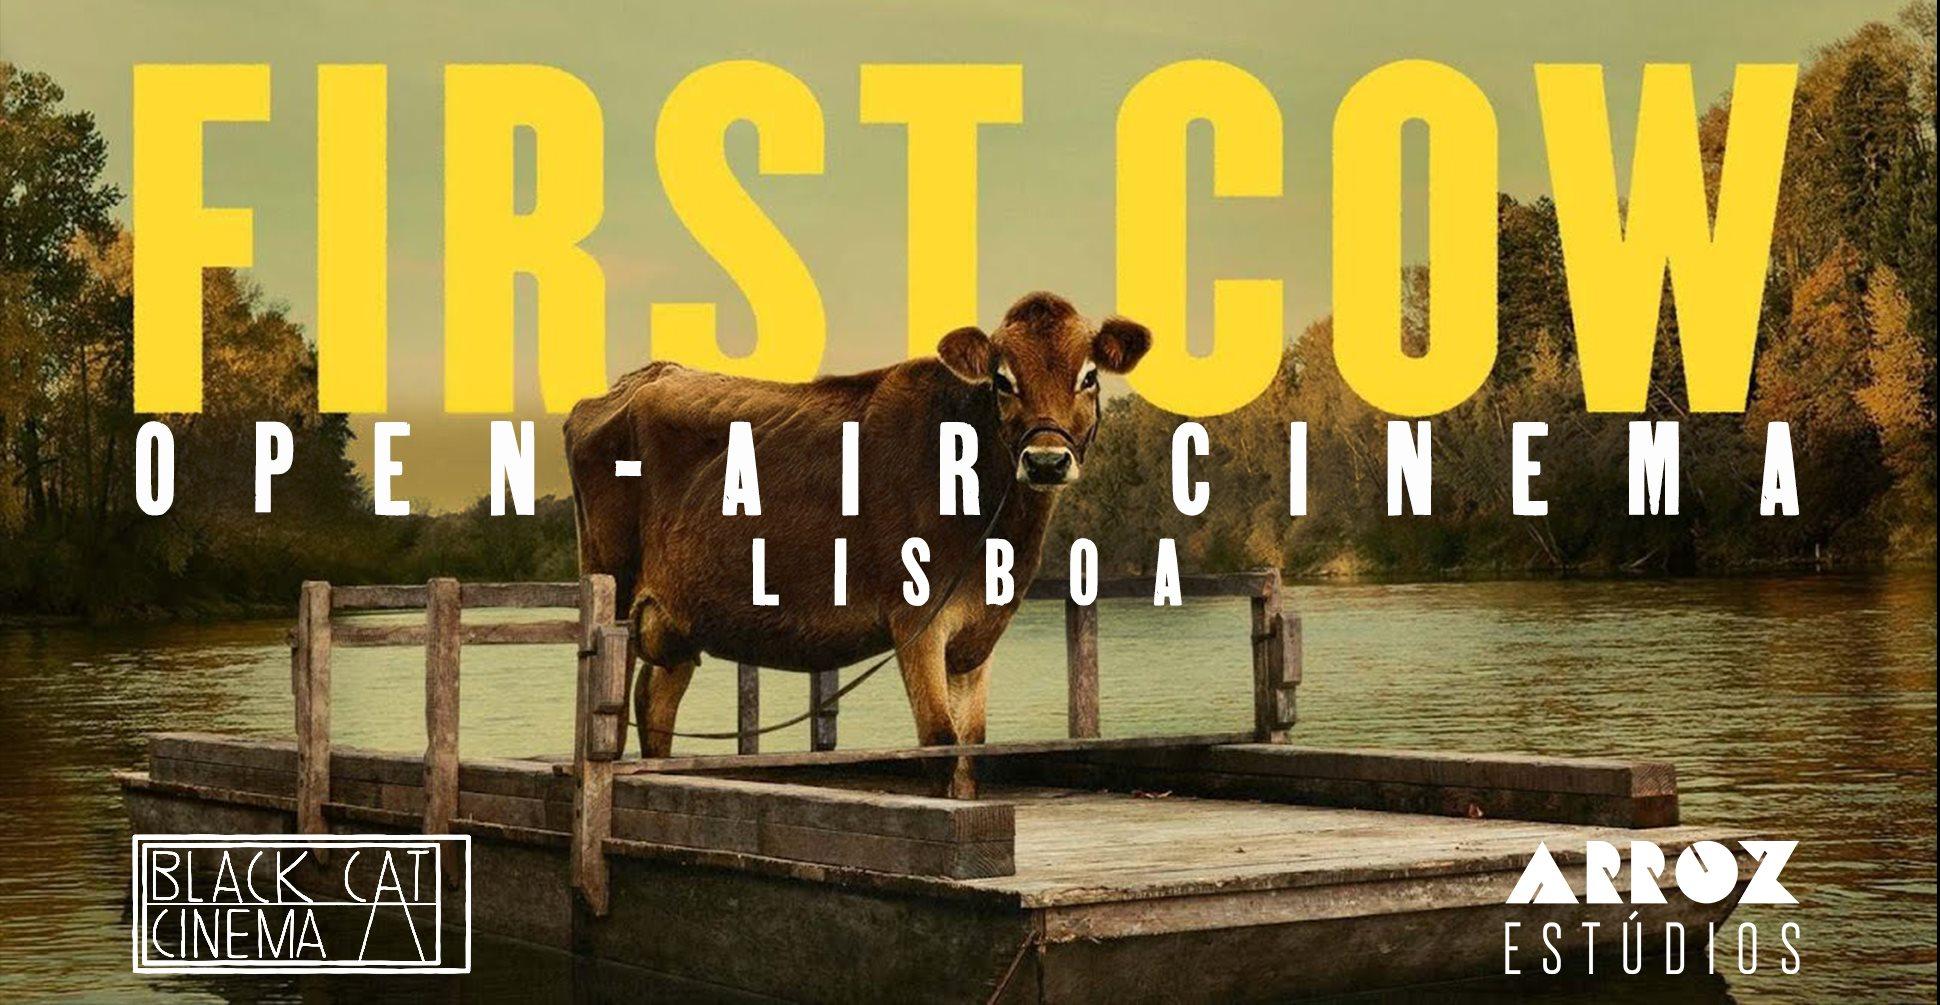 Open-air cinema: First Cow